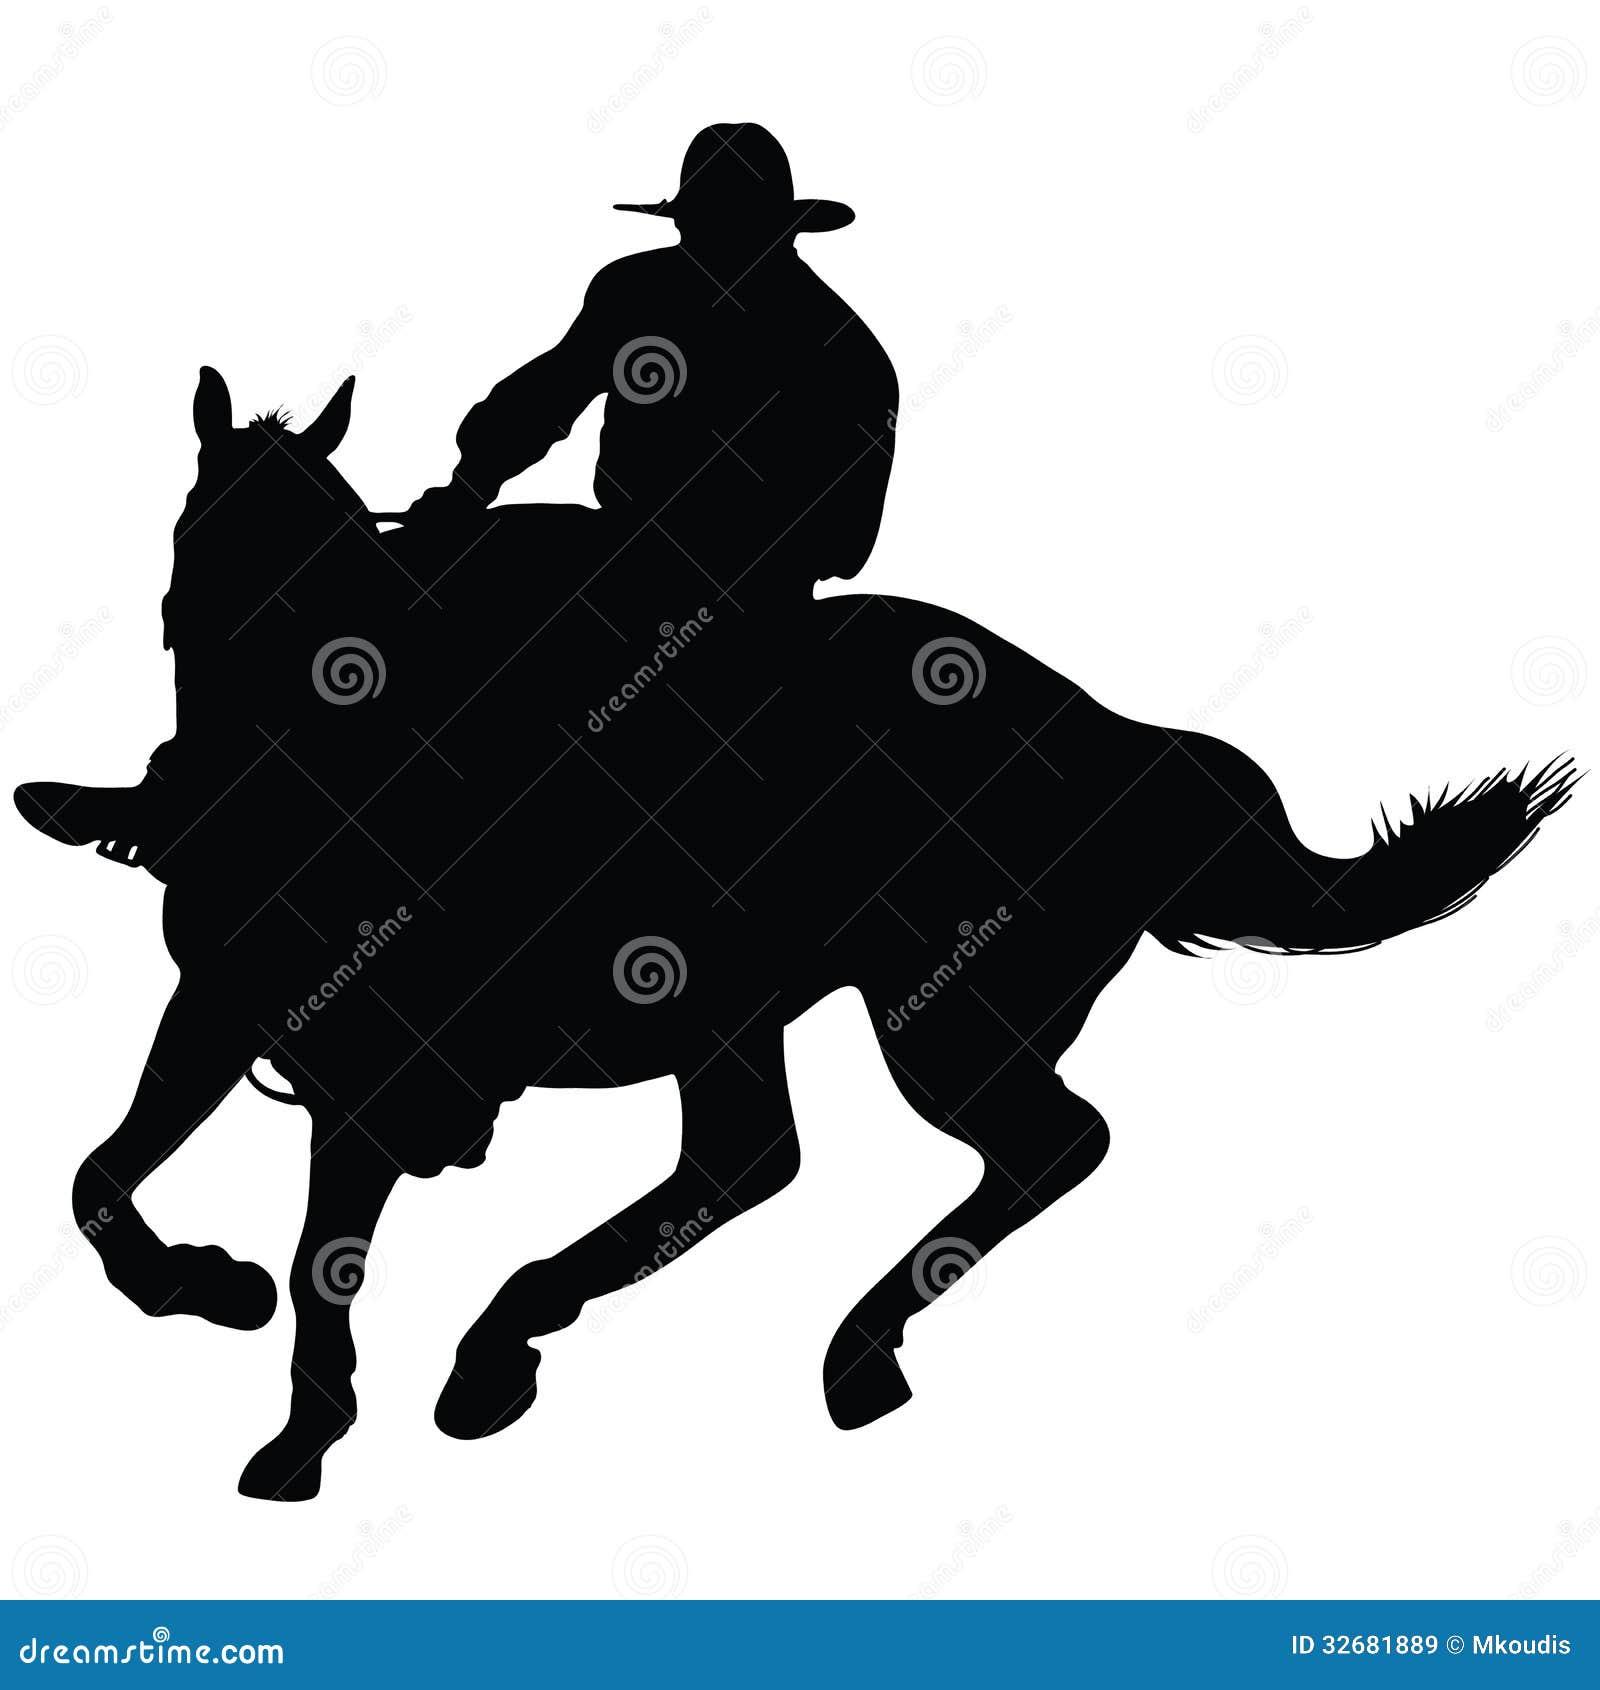 horseman royalty free stock images image 32681889 headless horseman clip art png Headless Horseman SVG